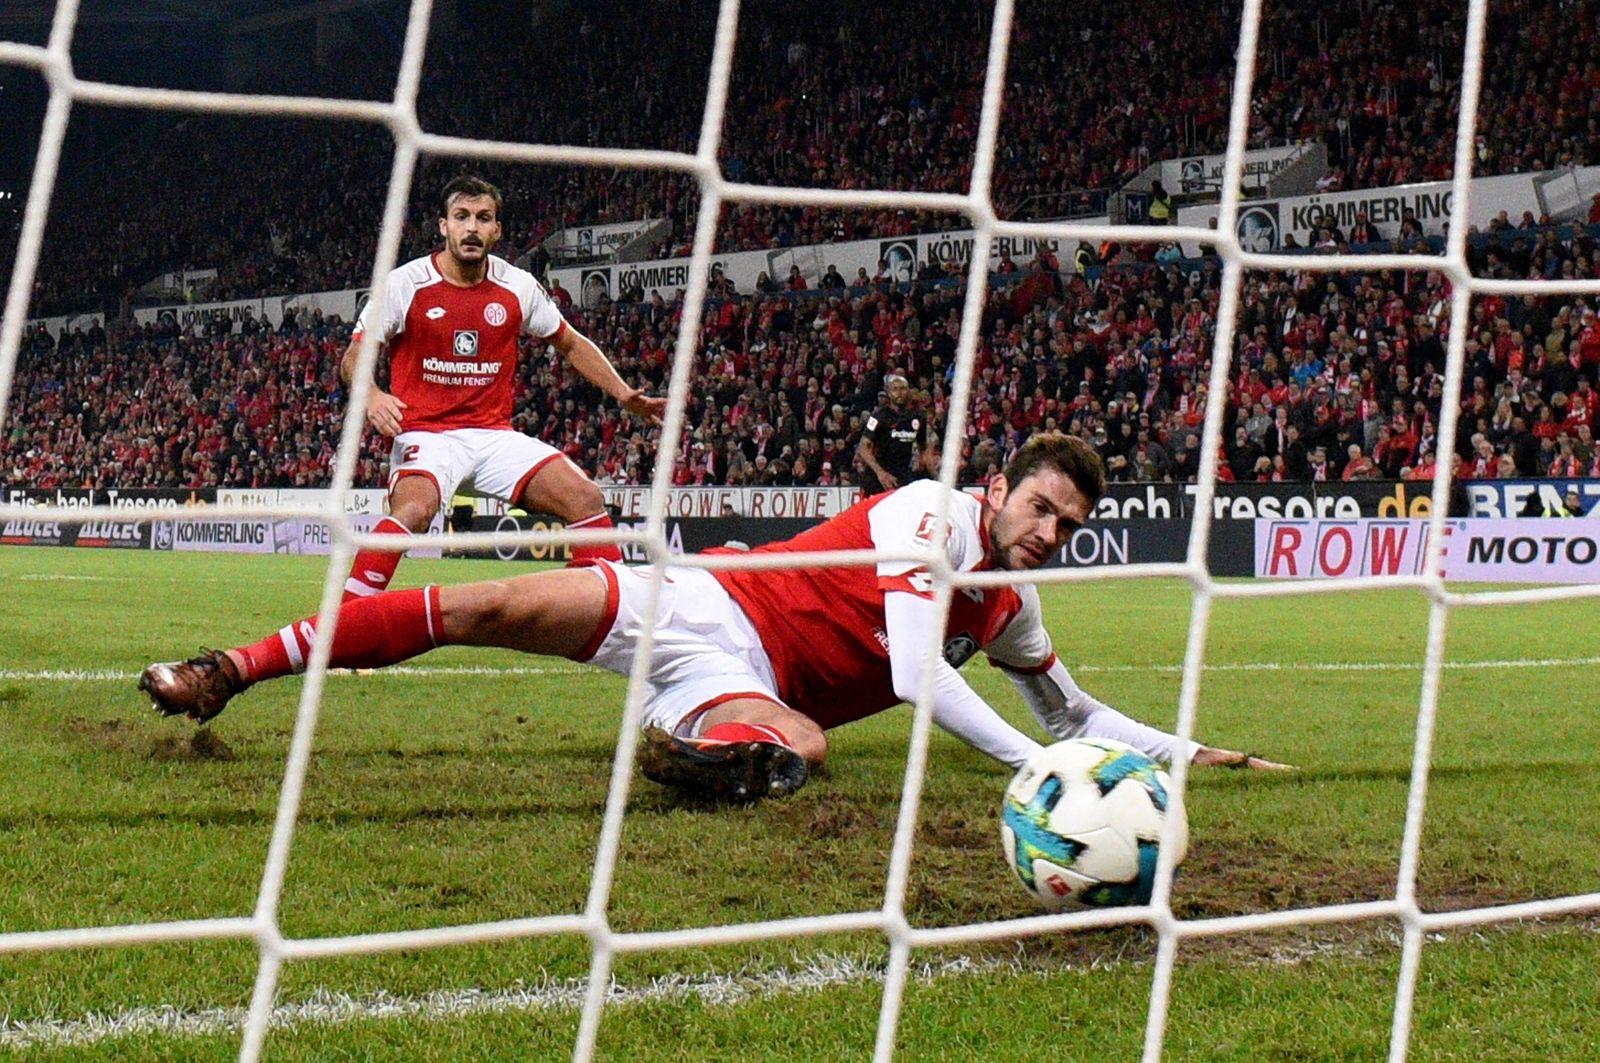 27 10 2017 xfux Fussball 1 Bundesliga FSV Mainz 05 Eintracht Frankfurt emspor v l Stefan Bel